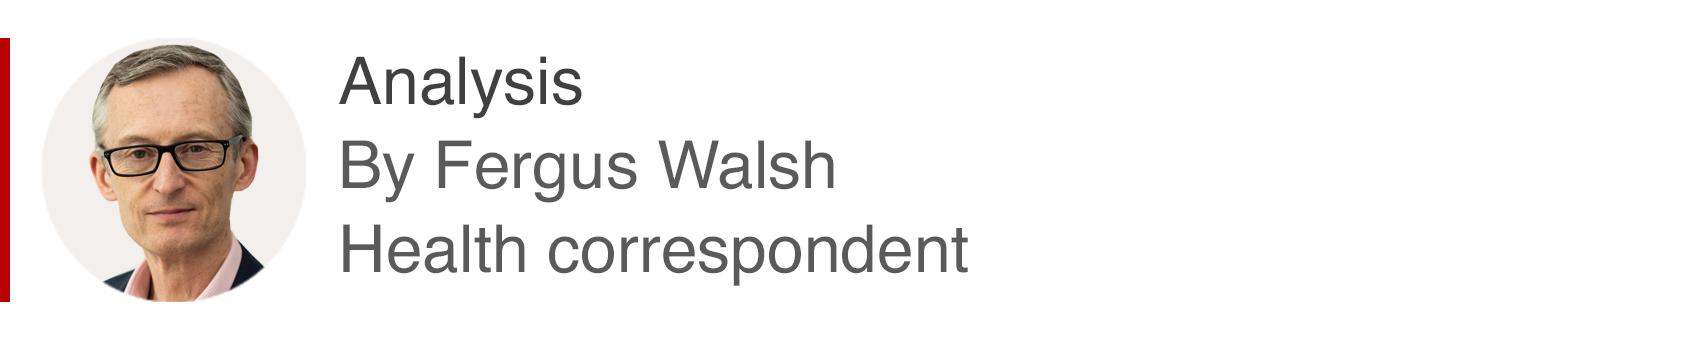 Analysis box by Fergus Walsh, health correspondent